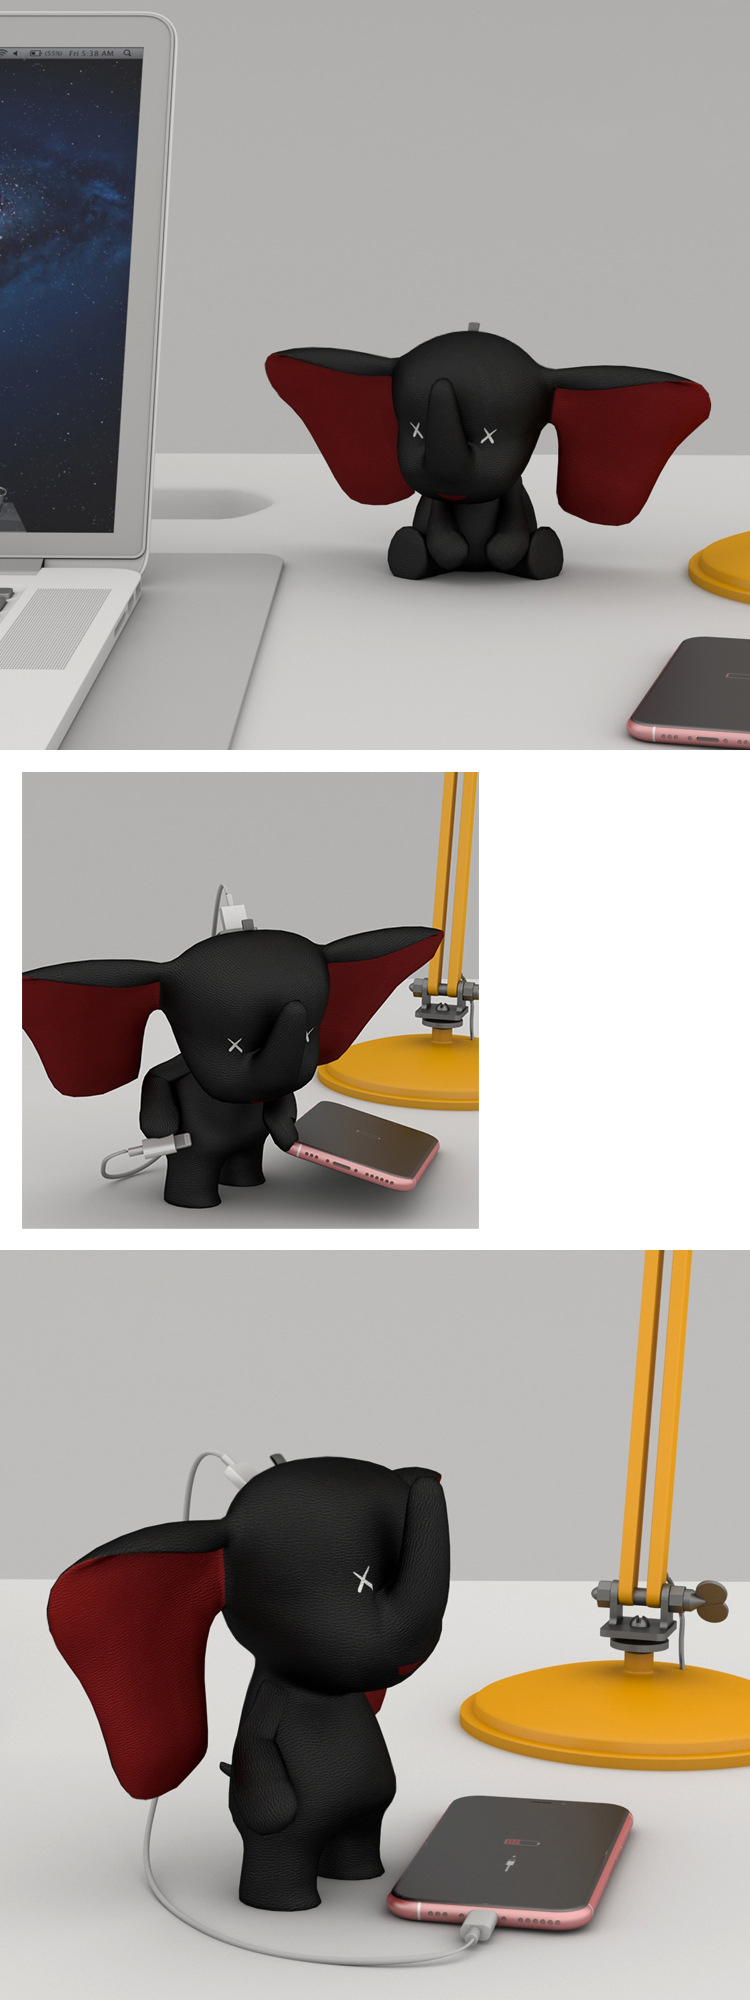 igrushechnyj slon s zarjadkoj dlja smartfona slon power bank pover bank 8800 mach 03 - Слон с зарядкой для смартфона/ слон-Power Bank (повер-банк) 8800 мАч